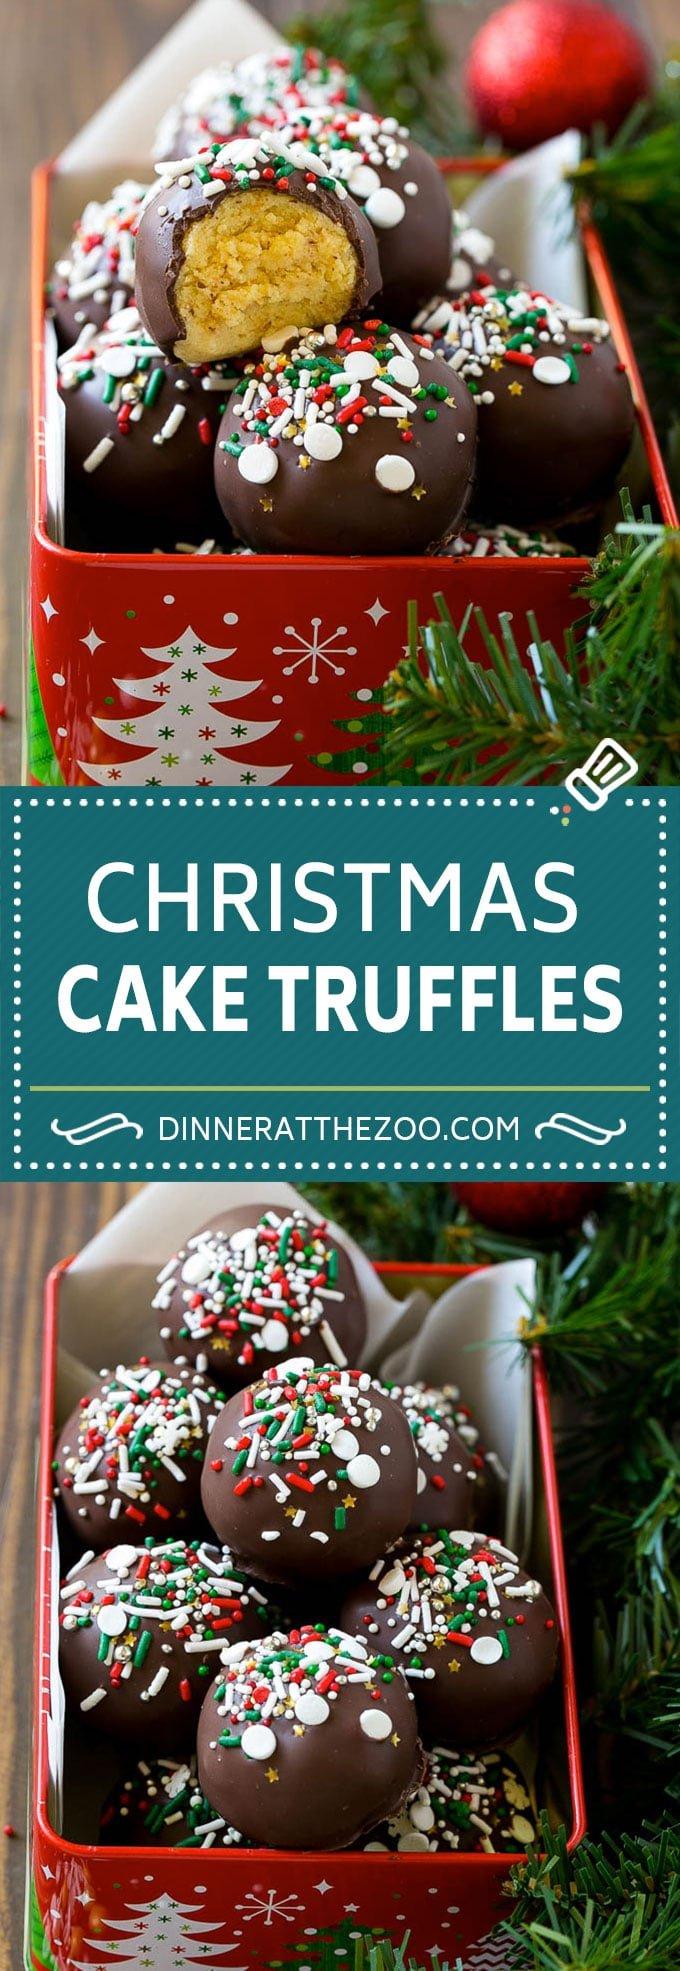 Christmas Cake Truffles Recipe | Cake Truffles | Cake Balls | Cake Bites #cake #christmas #sprinkles #baking #dinneratthezoo